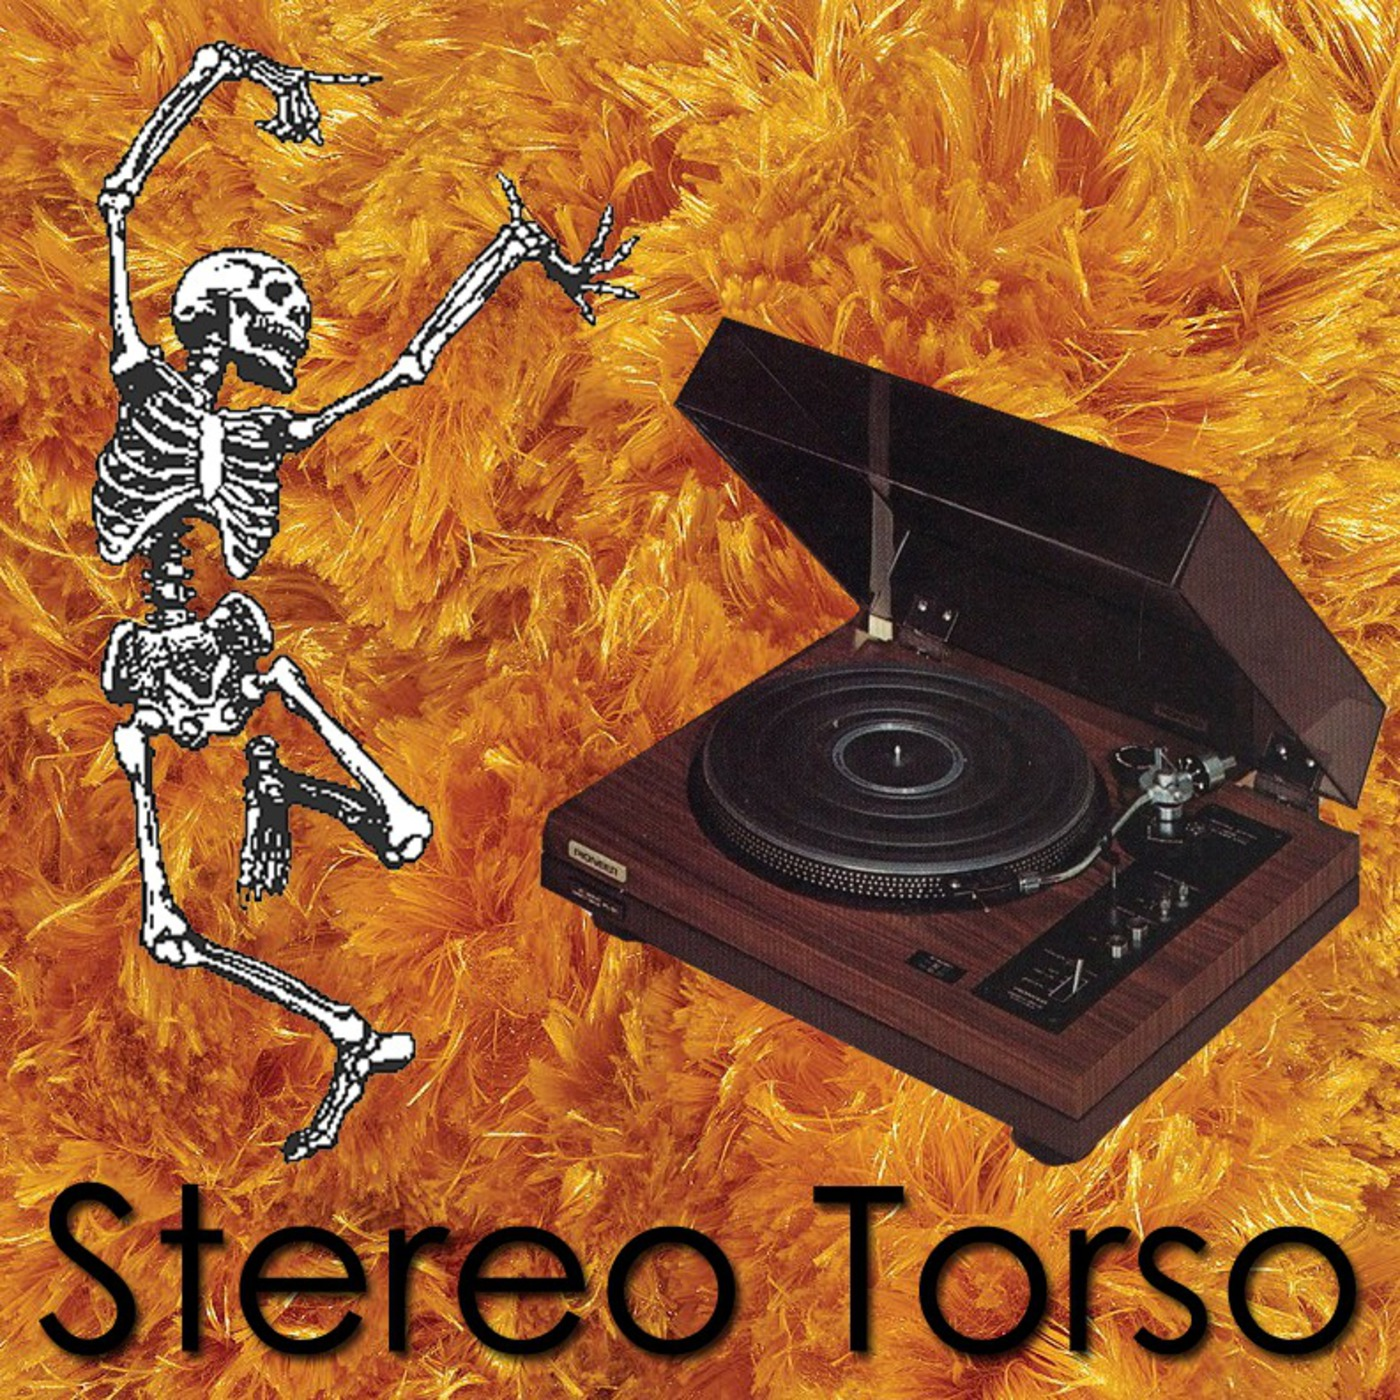 Stereo Torso